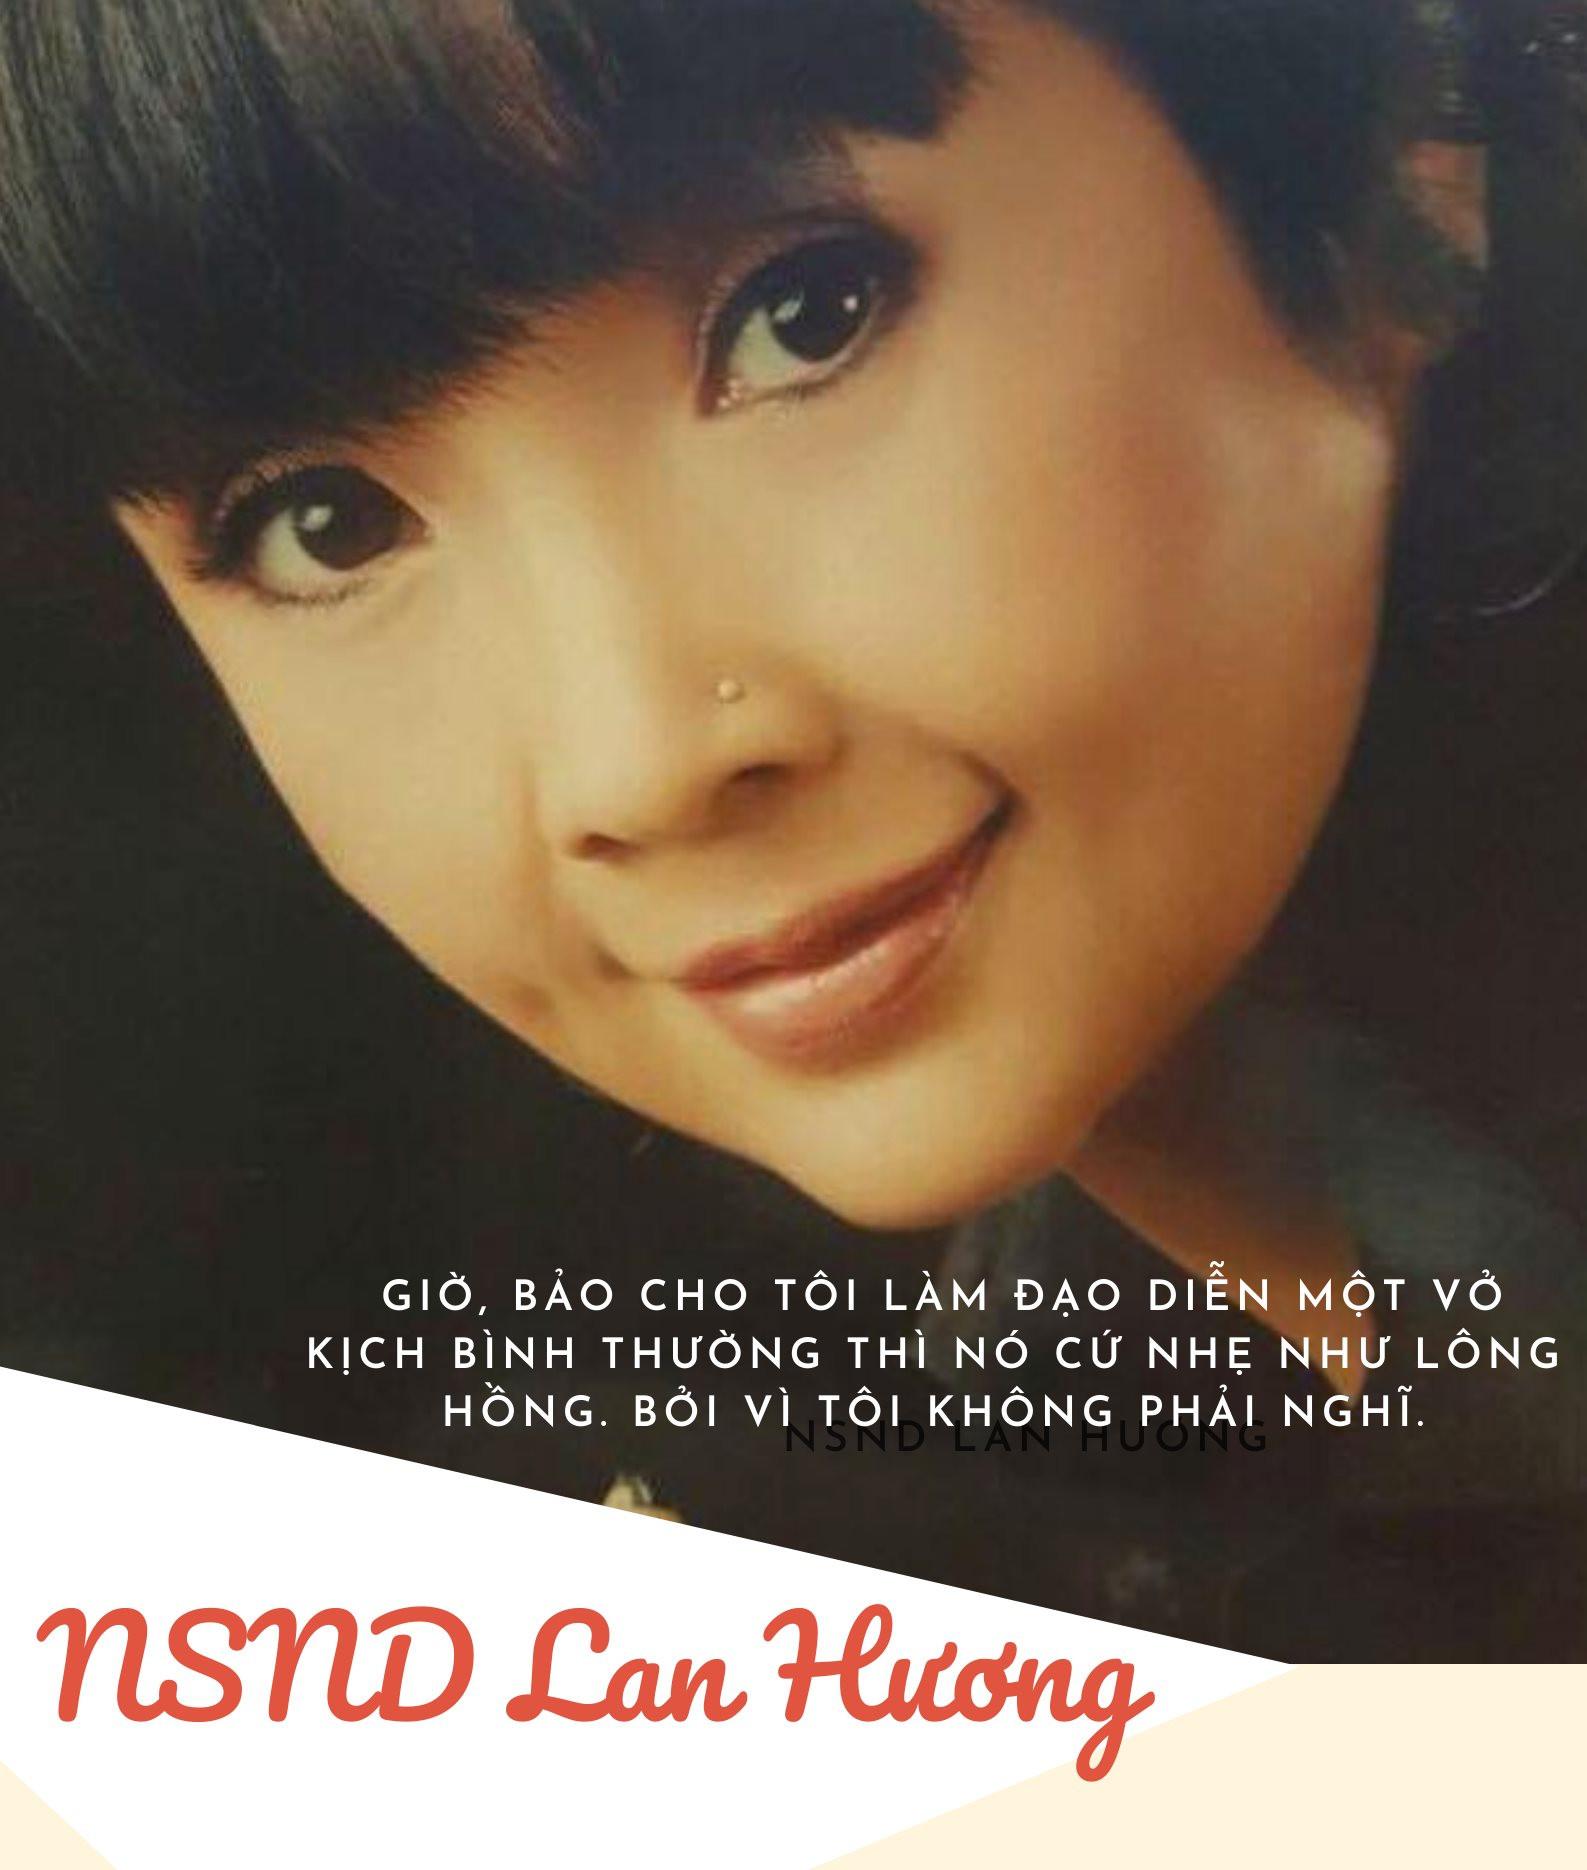 vovlive-tro-chuyen-vov-nsnd-lan-huong-2-1-.jpg